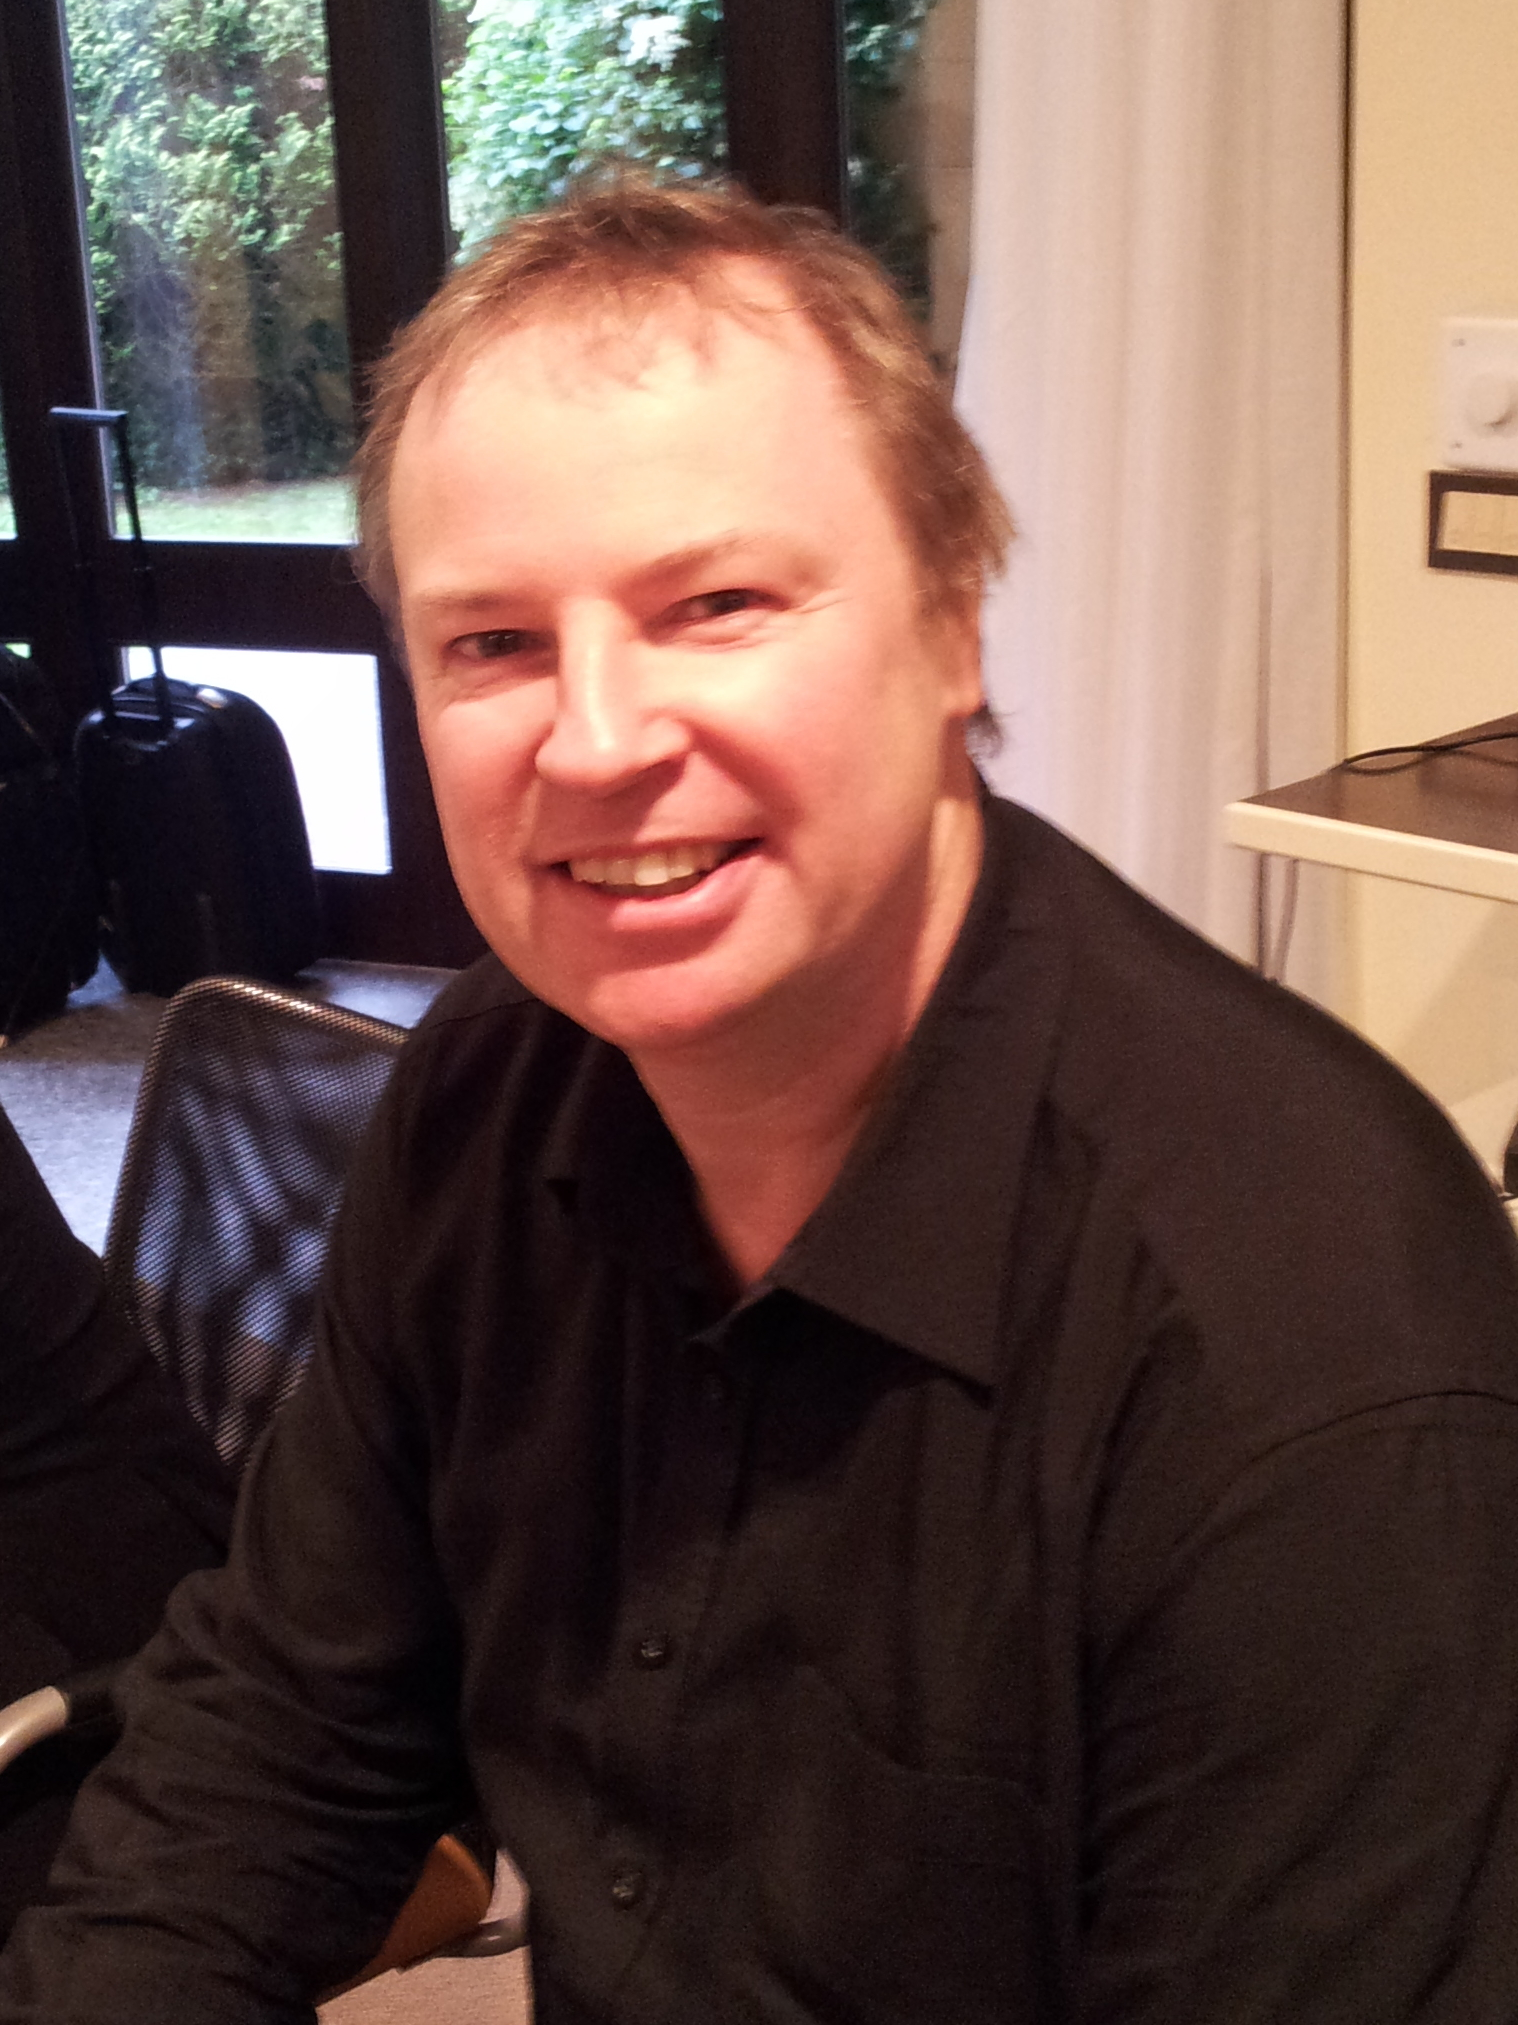 image of Peer Bork